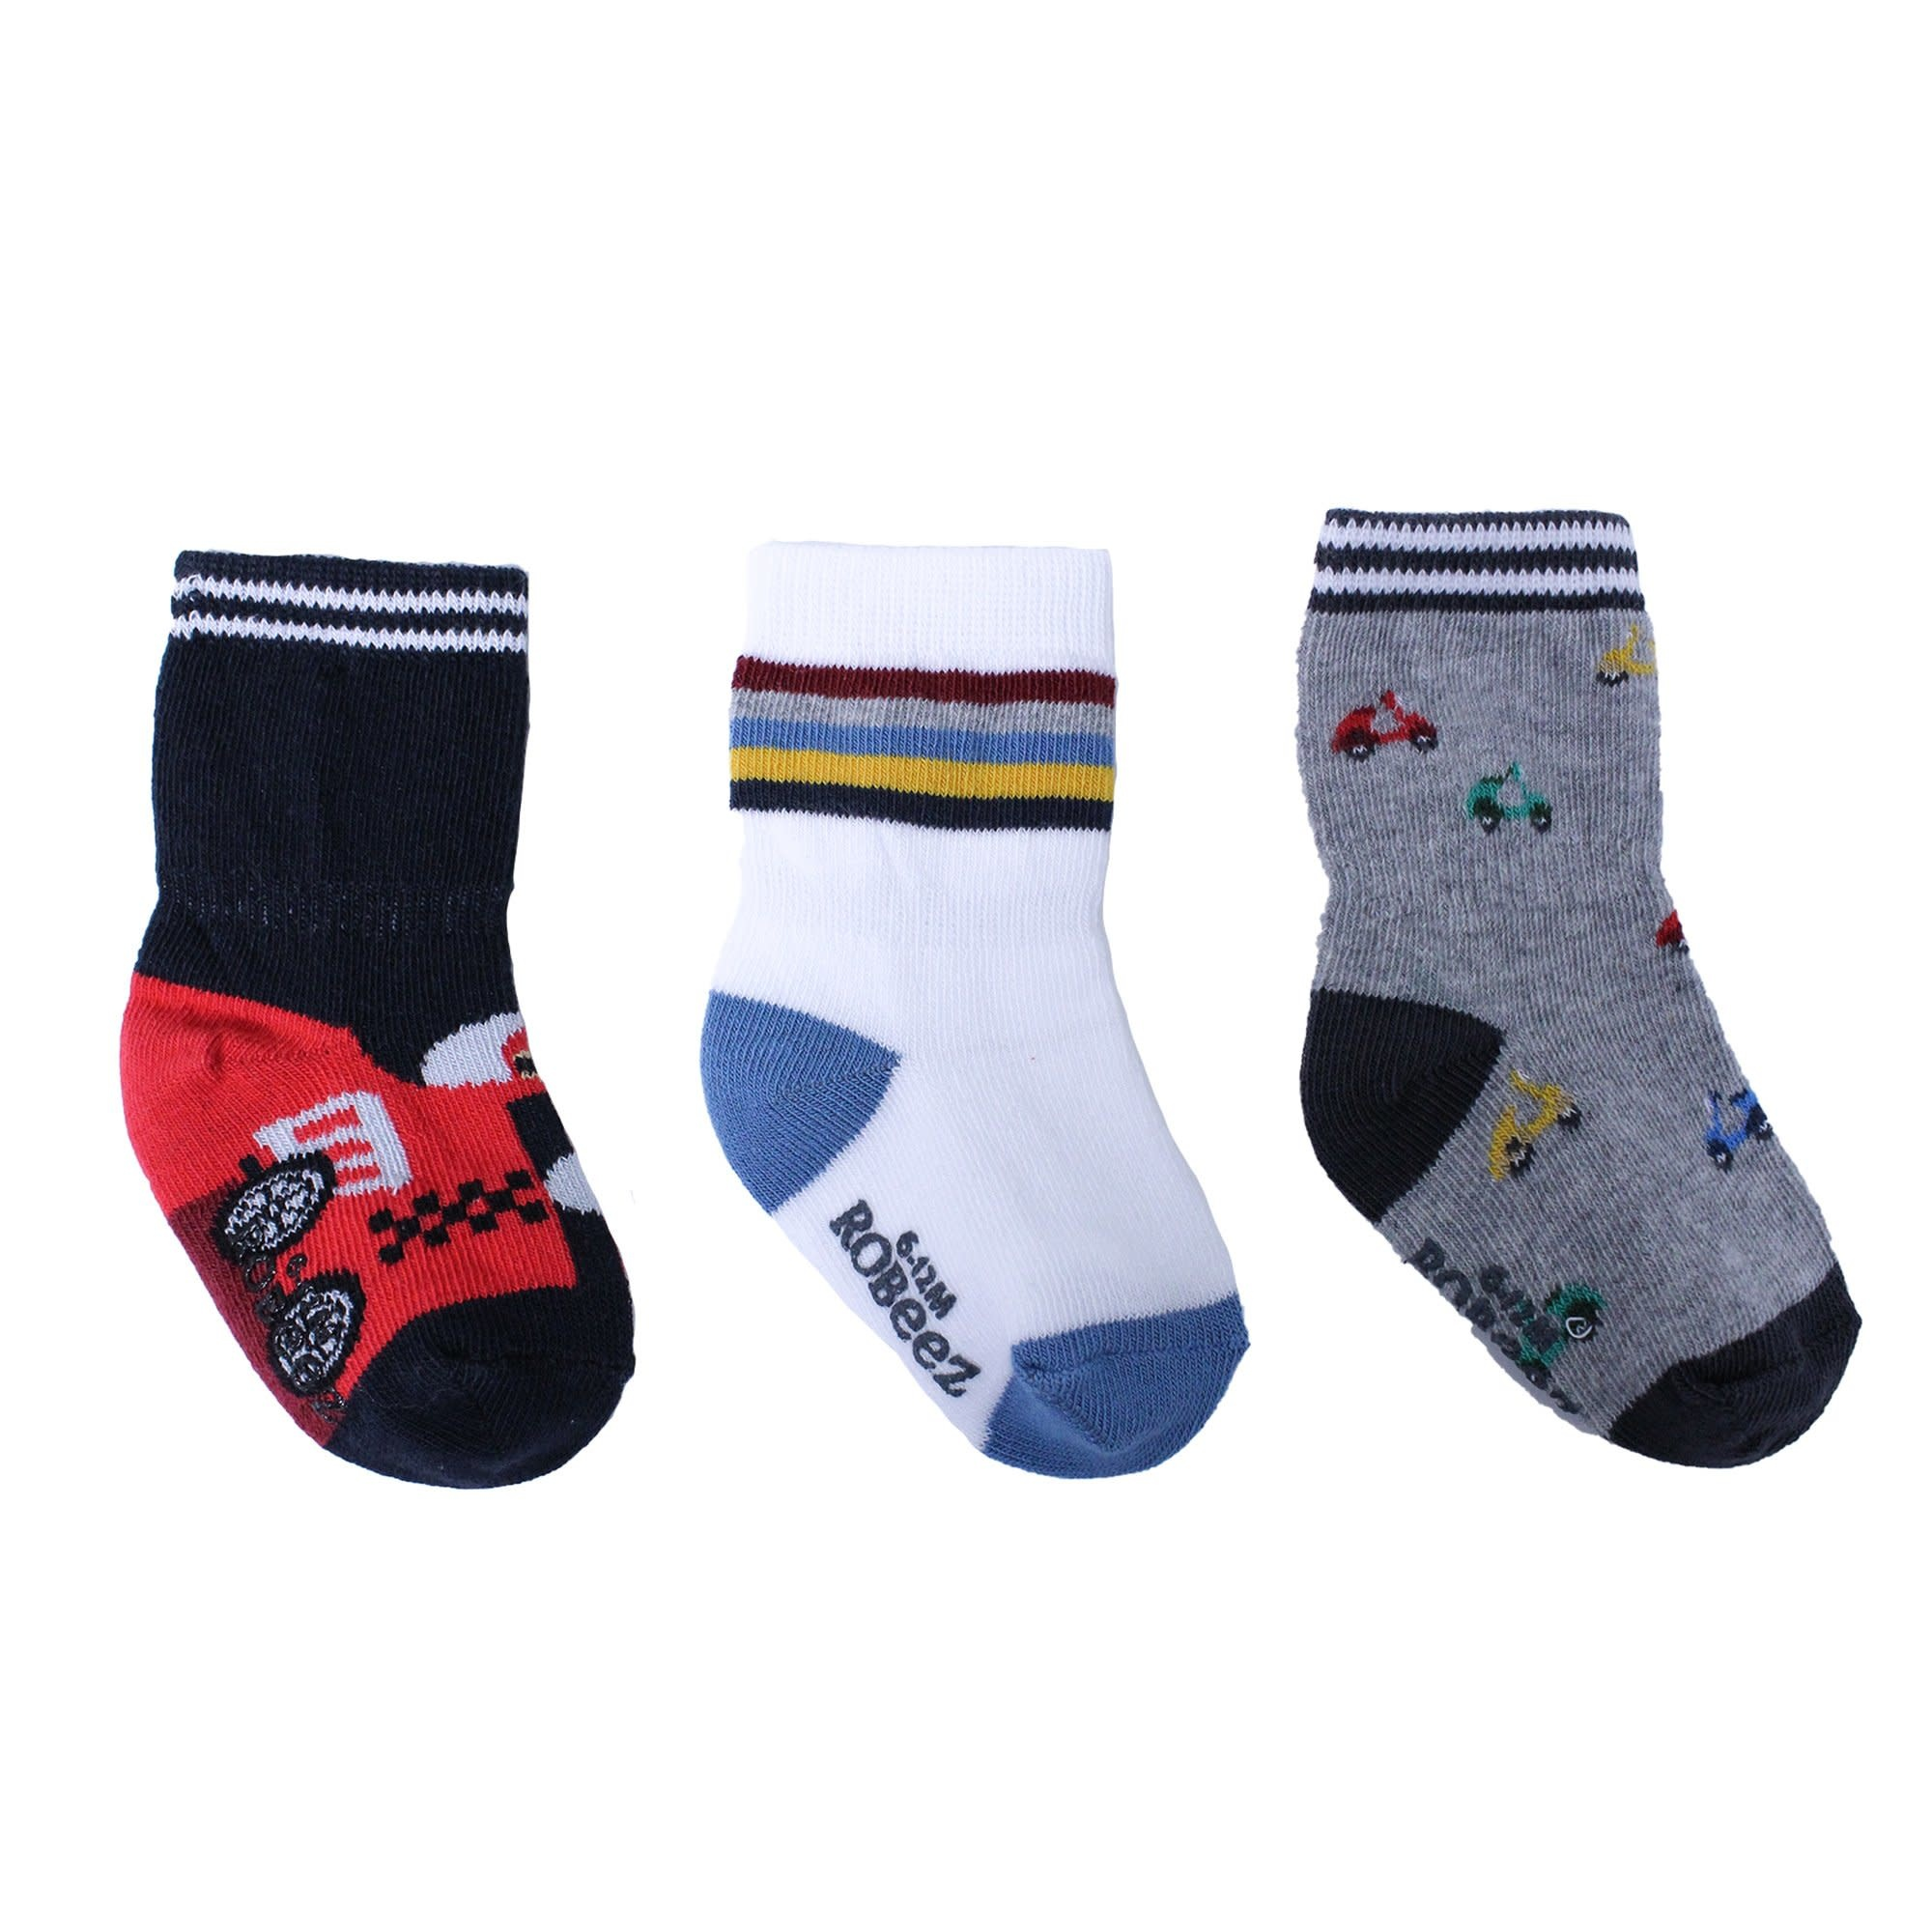 Robeez Socks - Racer